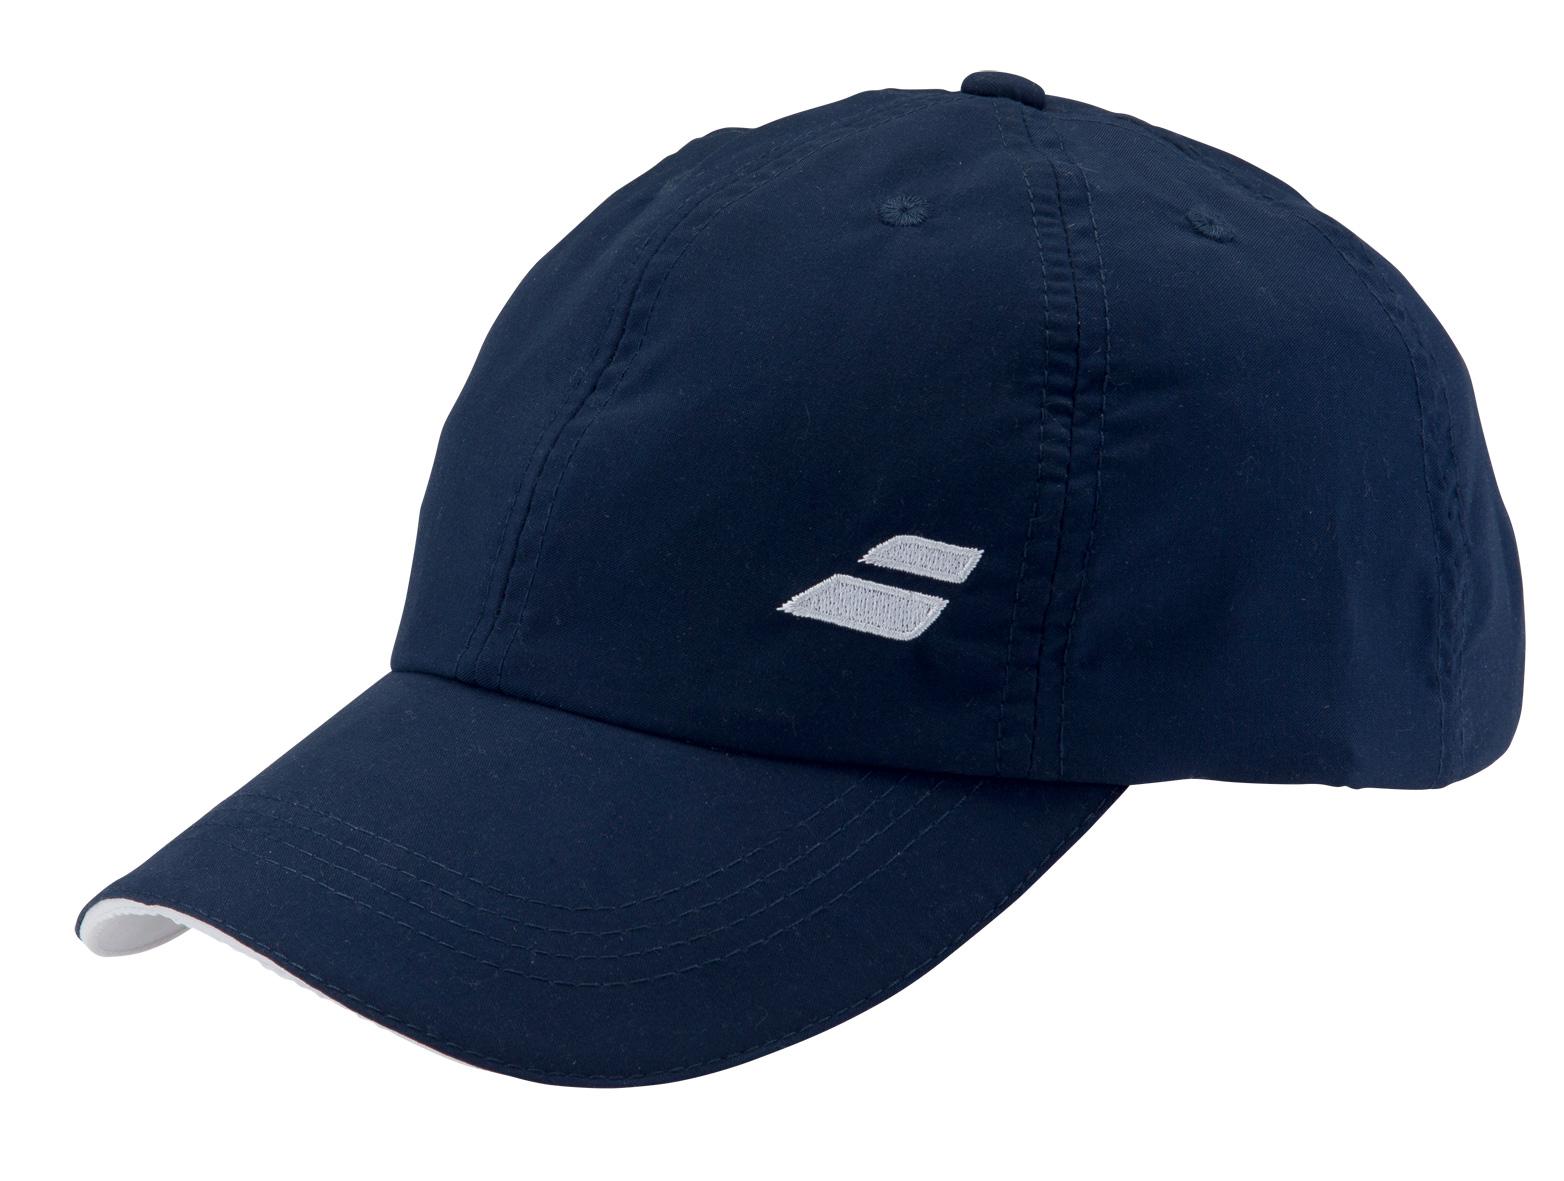 Babolat Cap Basic 2016 modrá - prodyšná čepice na tenis junior